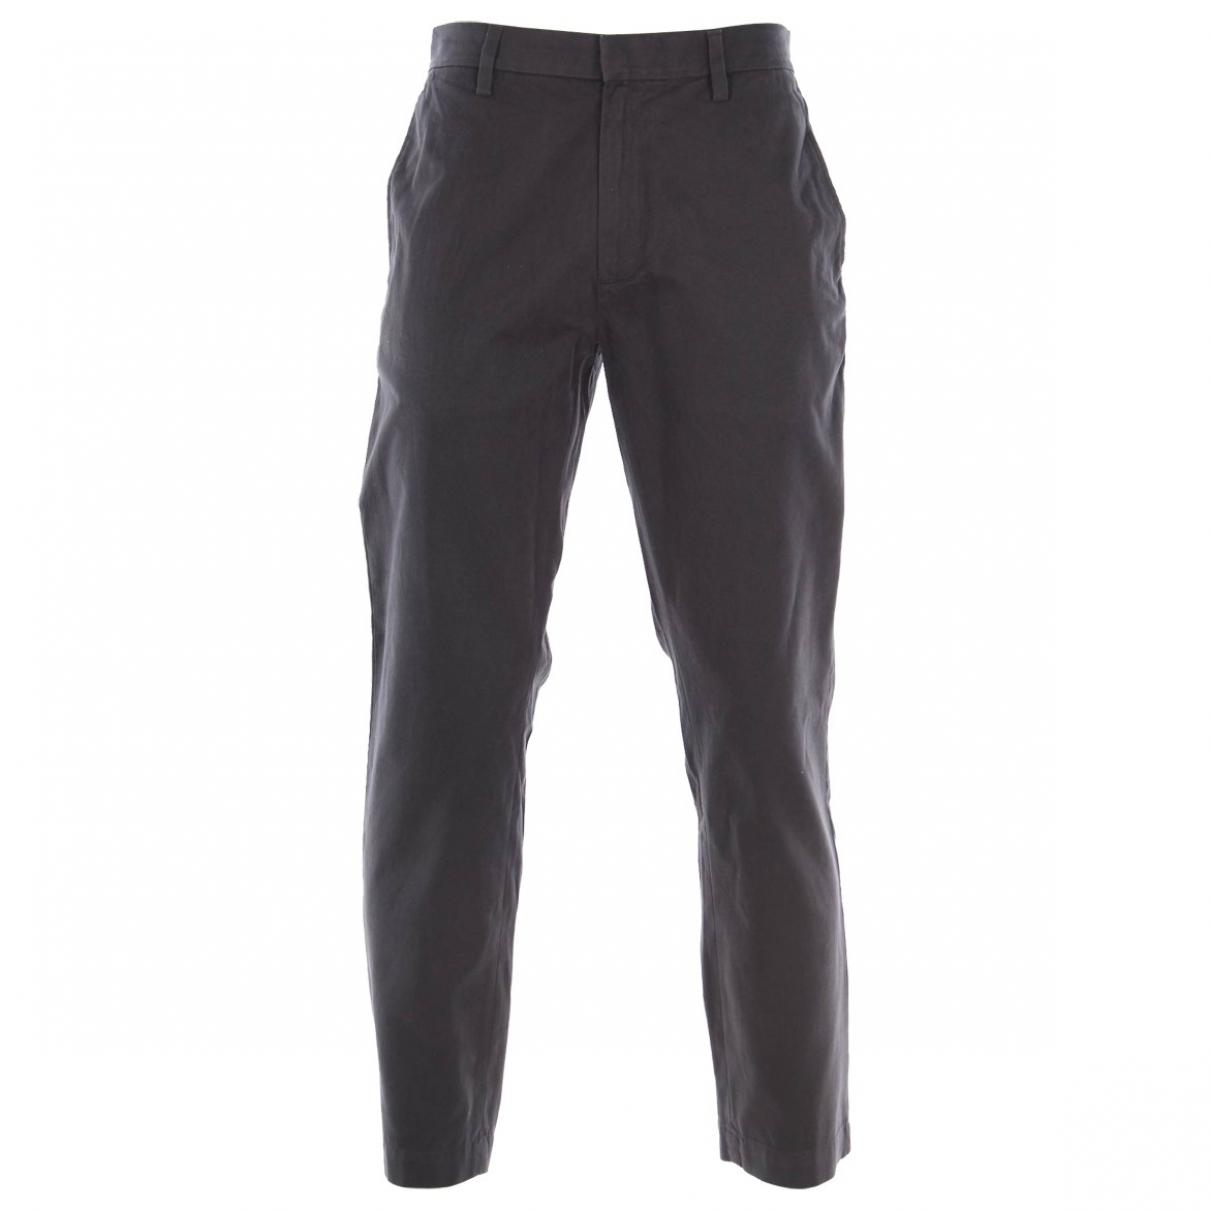 Banana Republic \N Grey Cotton Trousers for Men M International